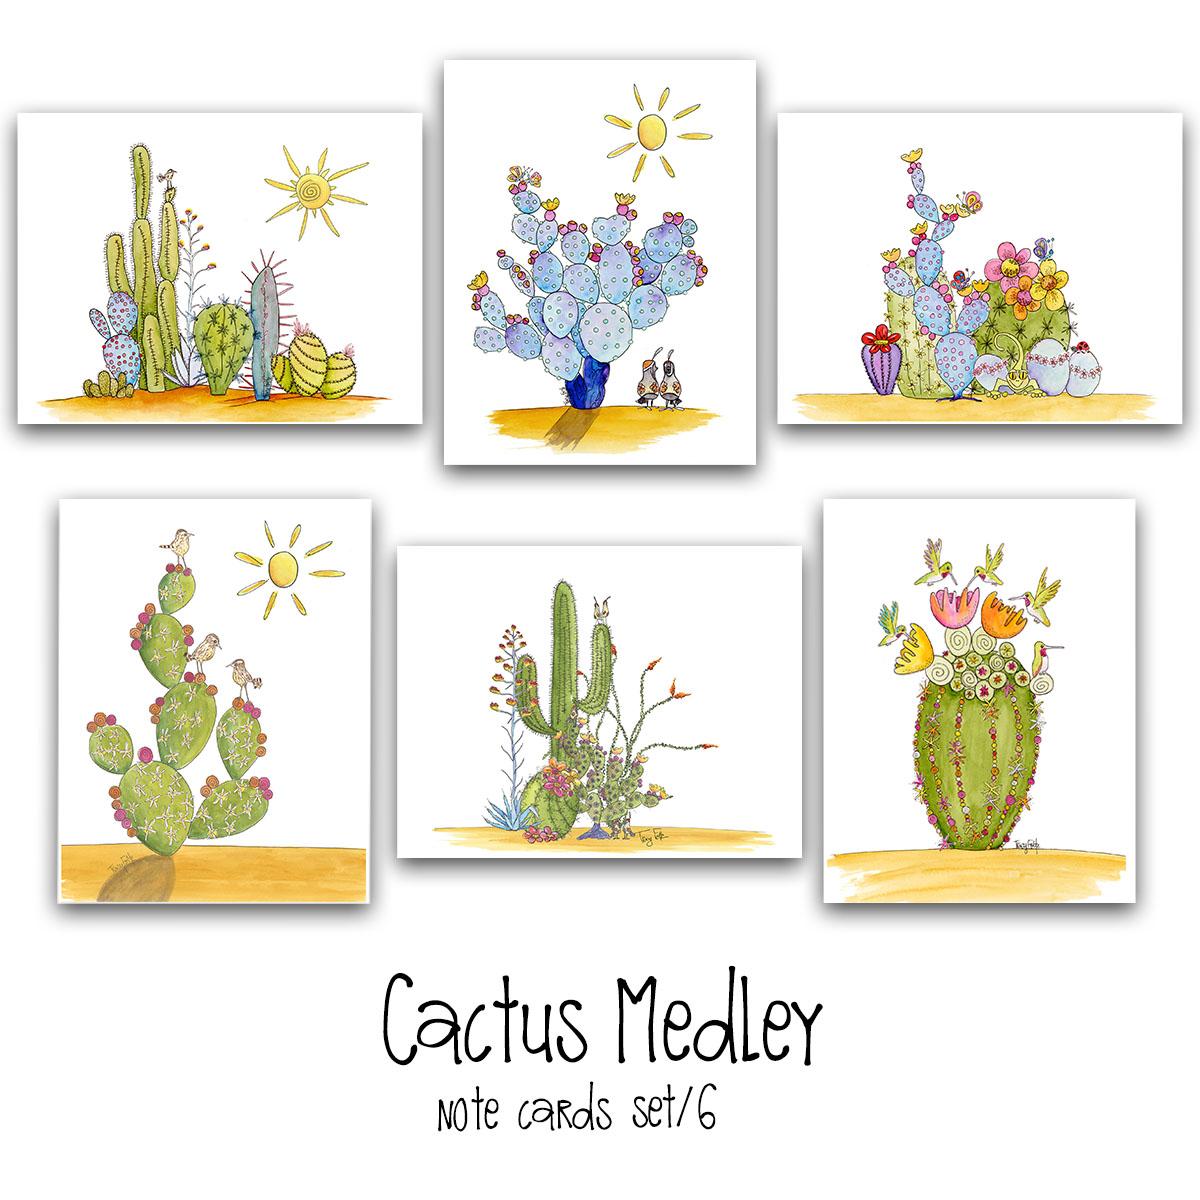 cactus medley note card set